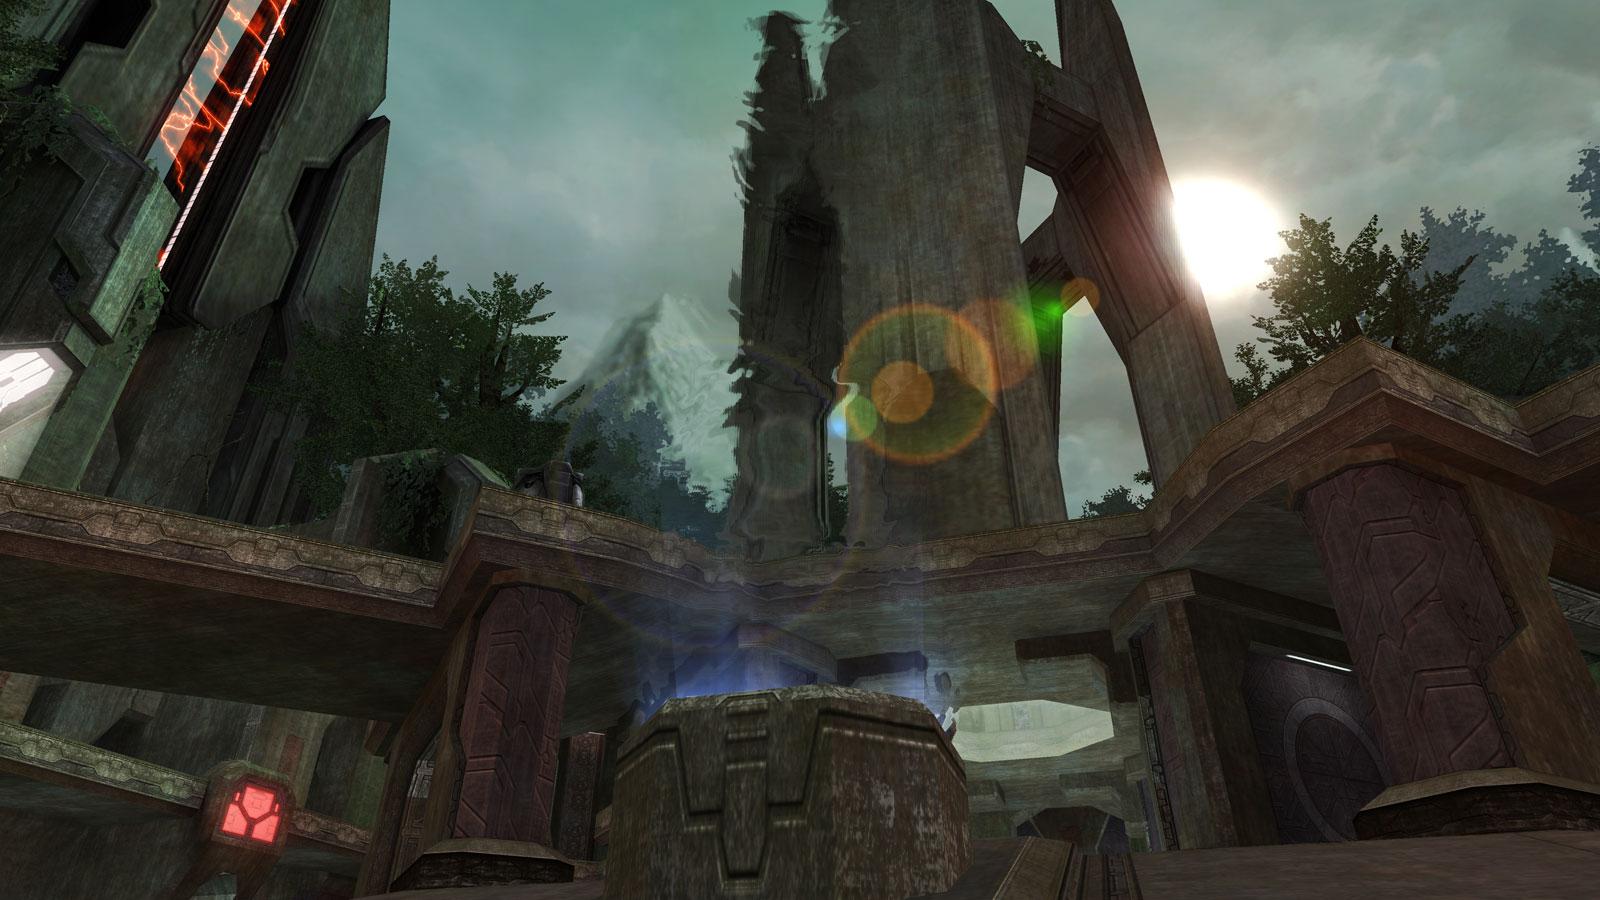 Halo2 DesolationMap jpg